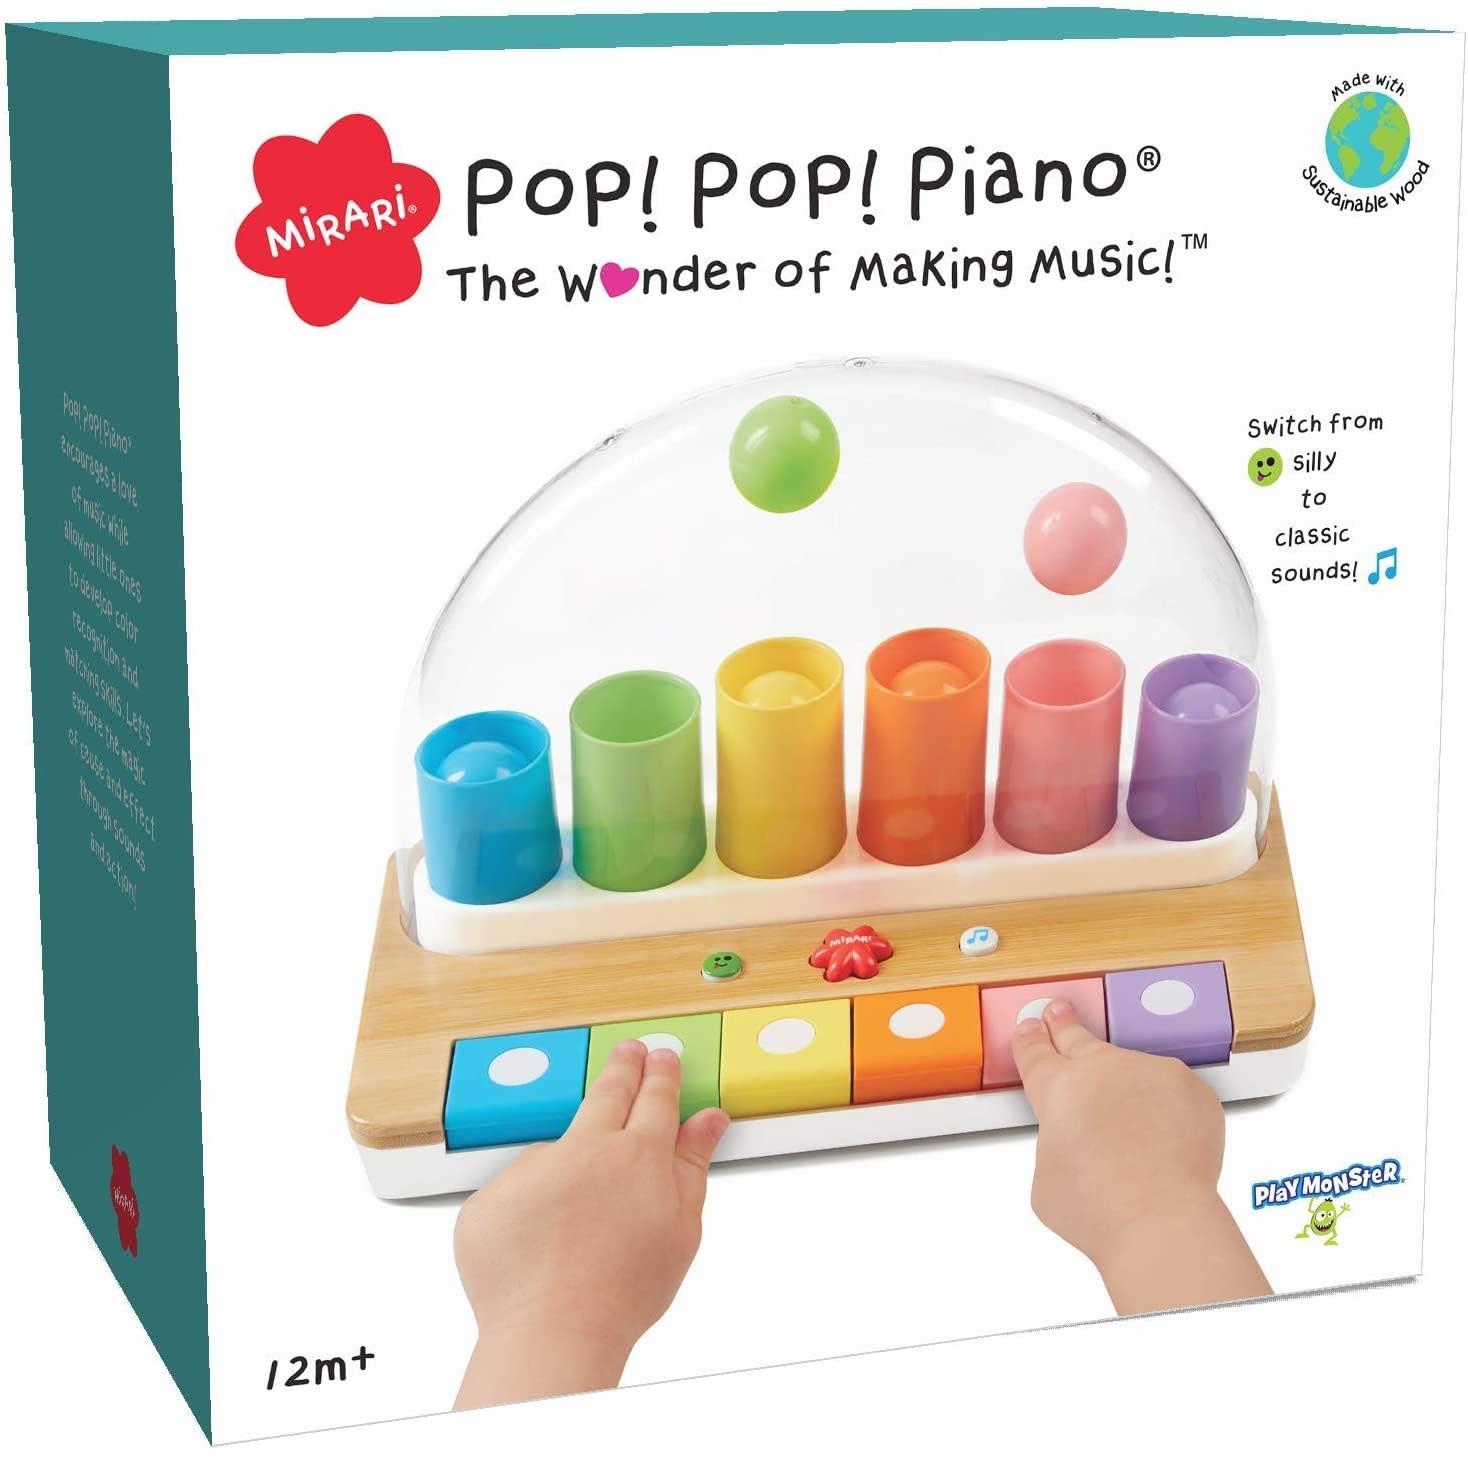 Pop! Pop! Piano by Mirari